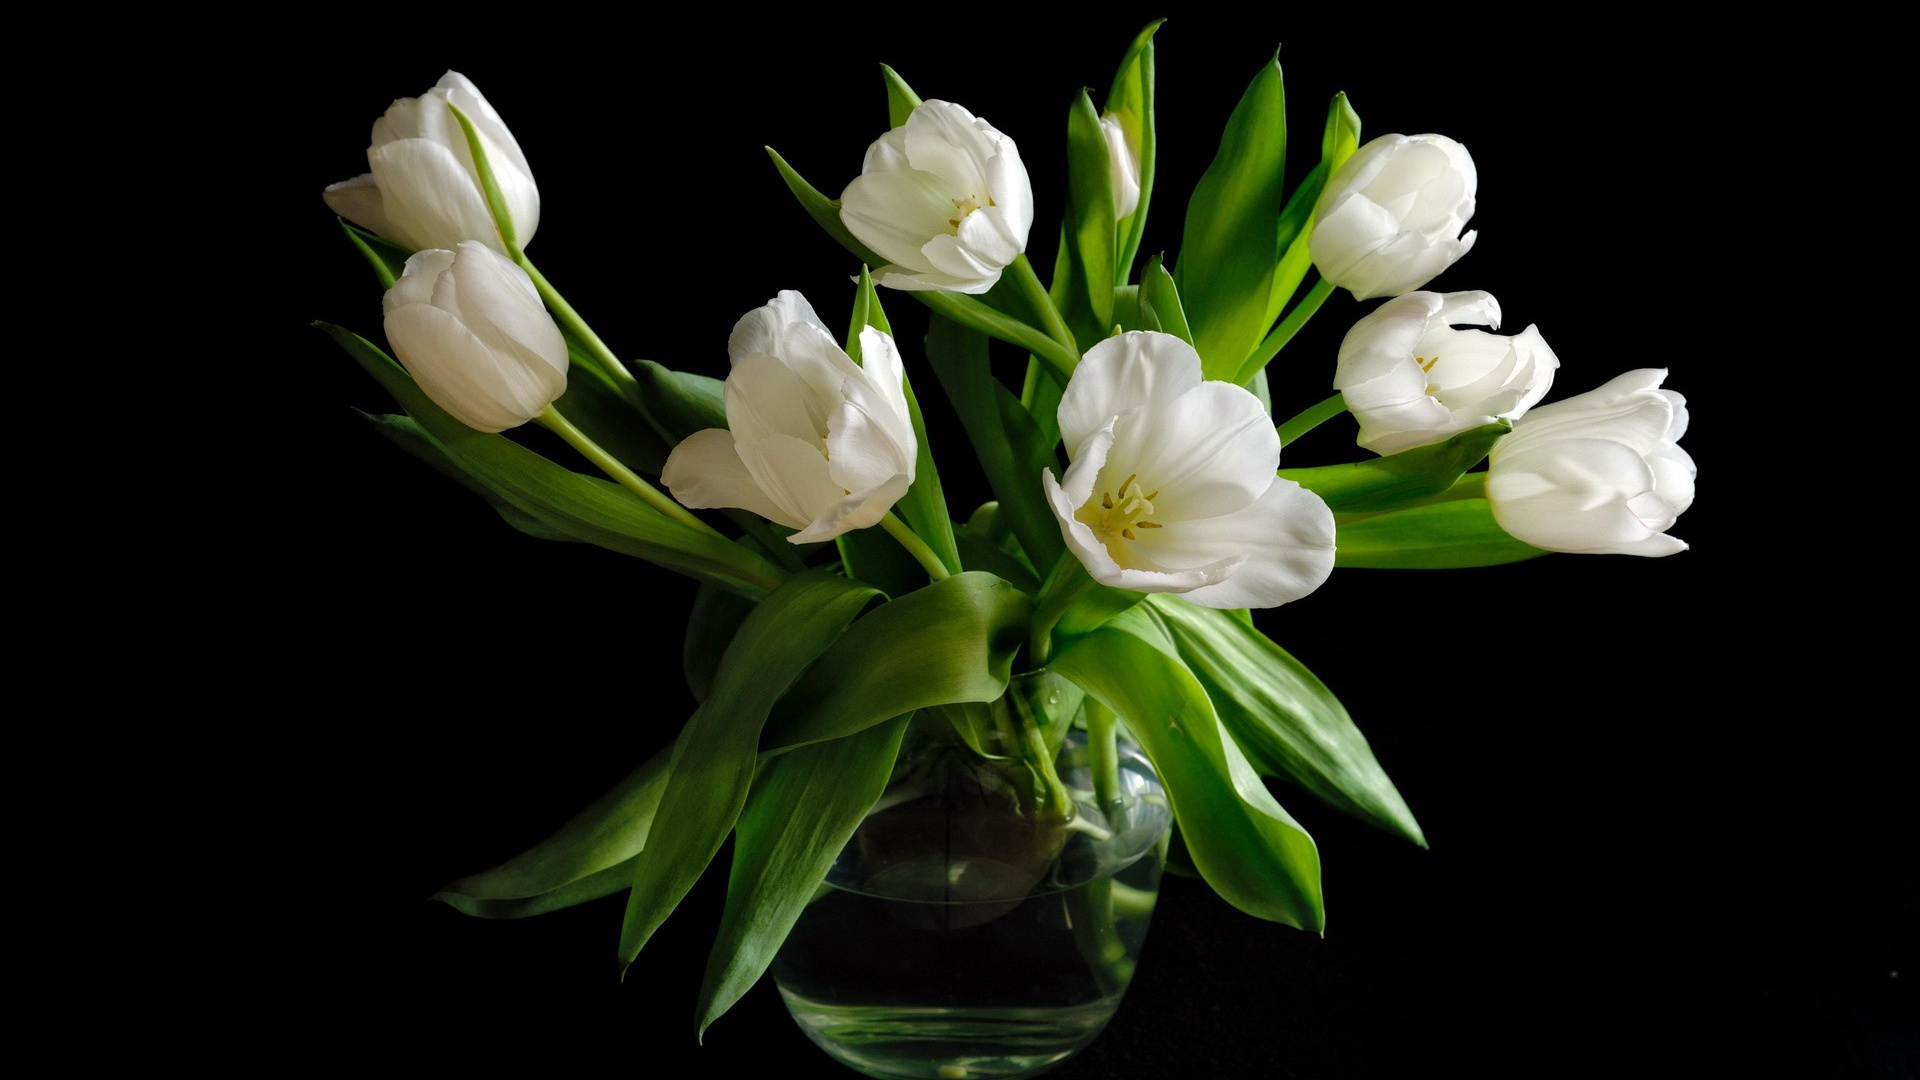 Download Wallpaper 1920x1080 Vase, white tulip flowers ...